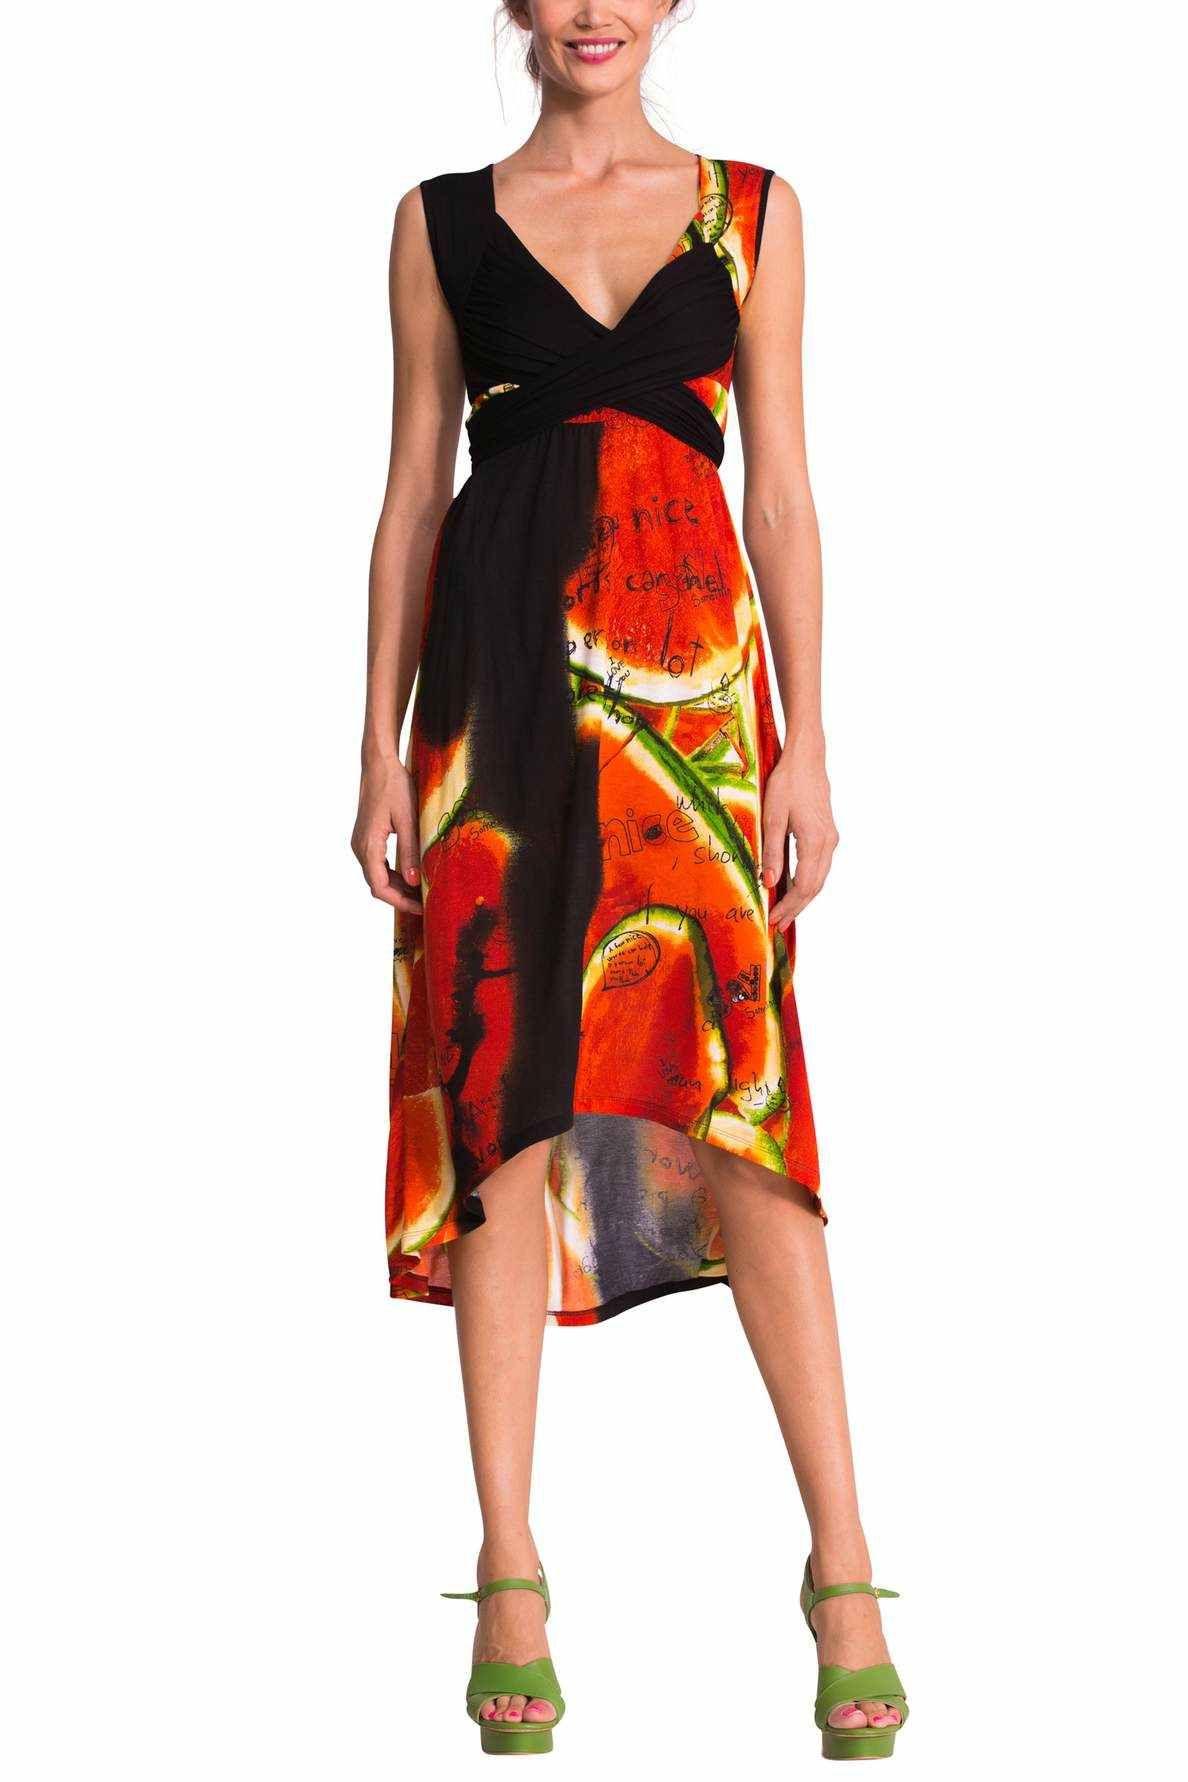 51V20Y0_3007 Desigual Dress Pral, Canada | Look Desigual | Pinterest ...